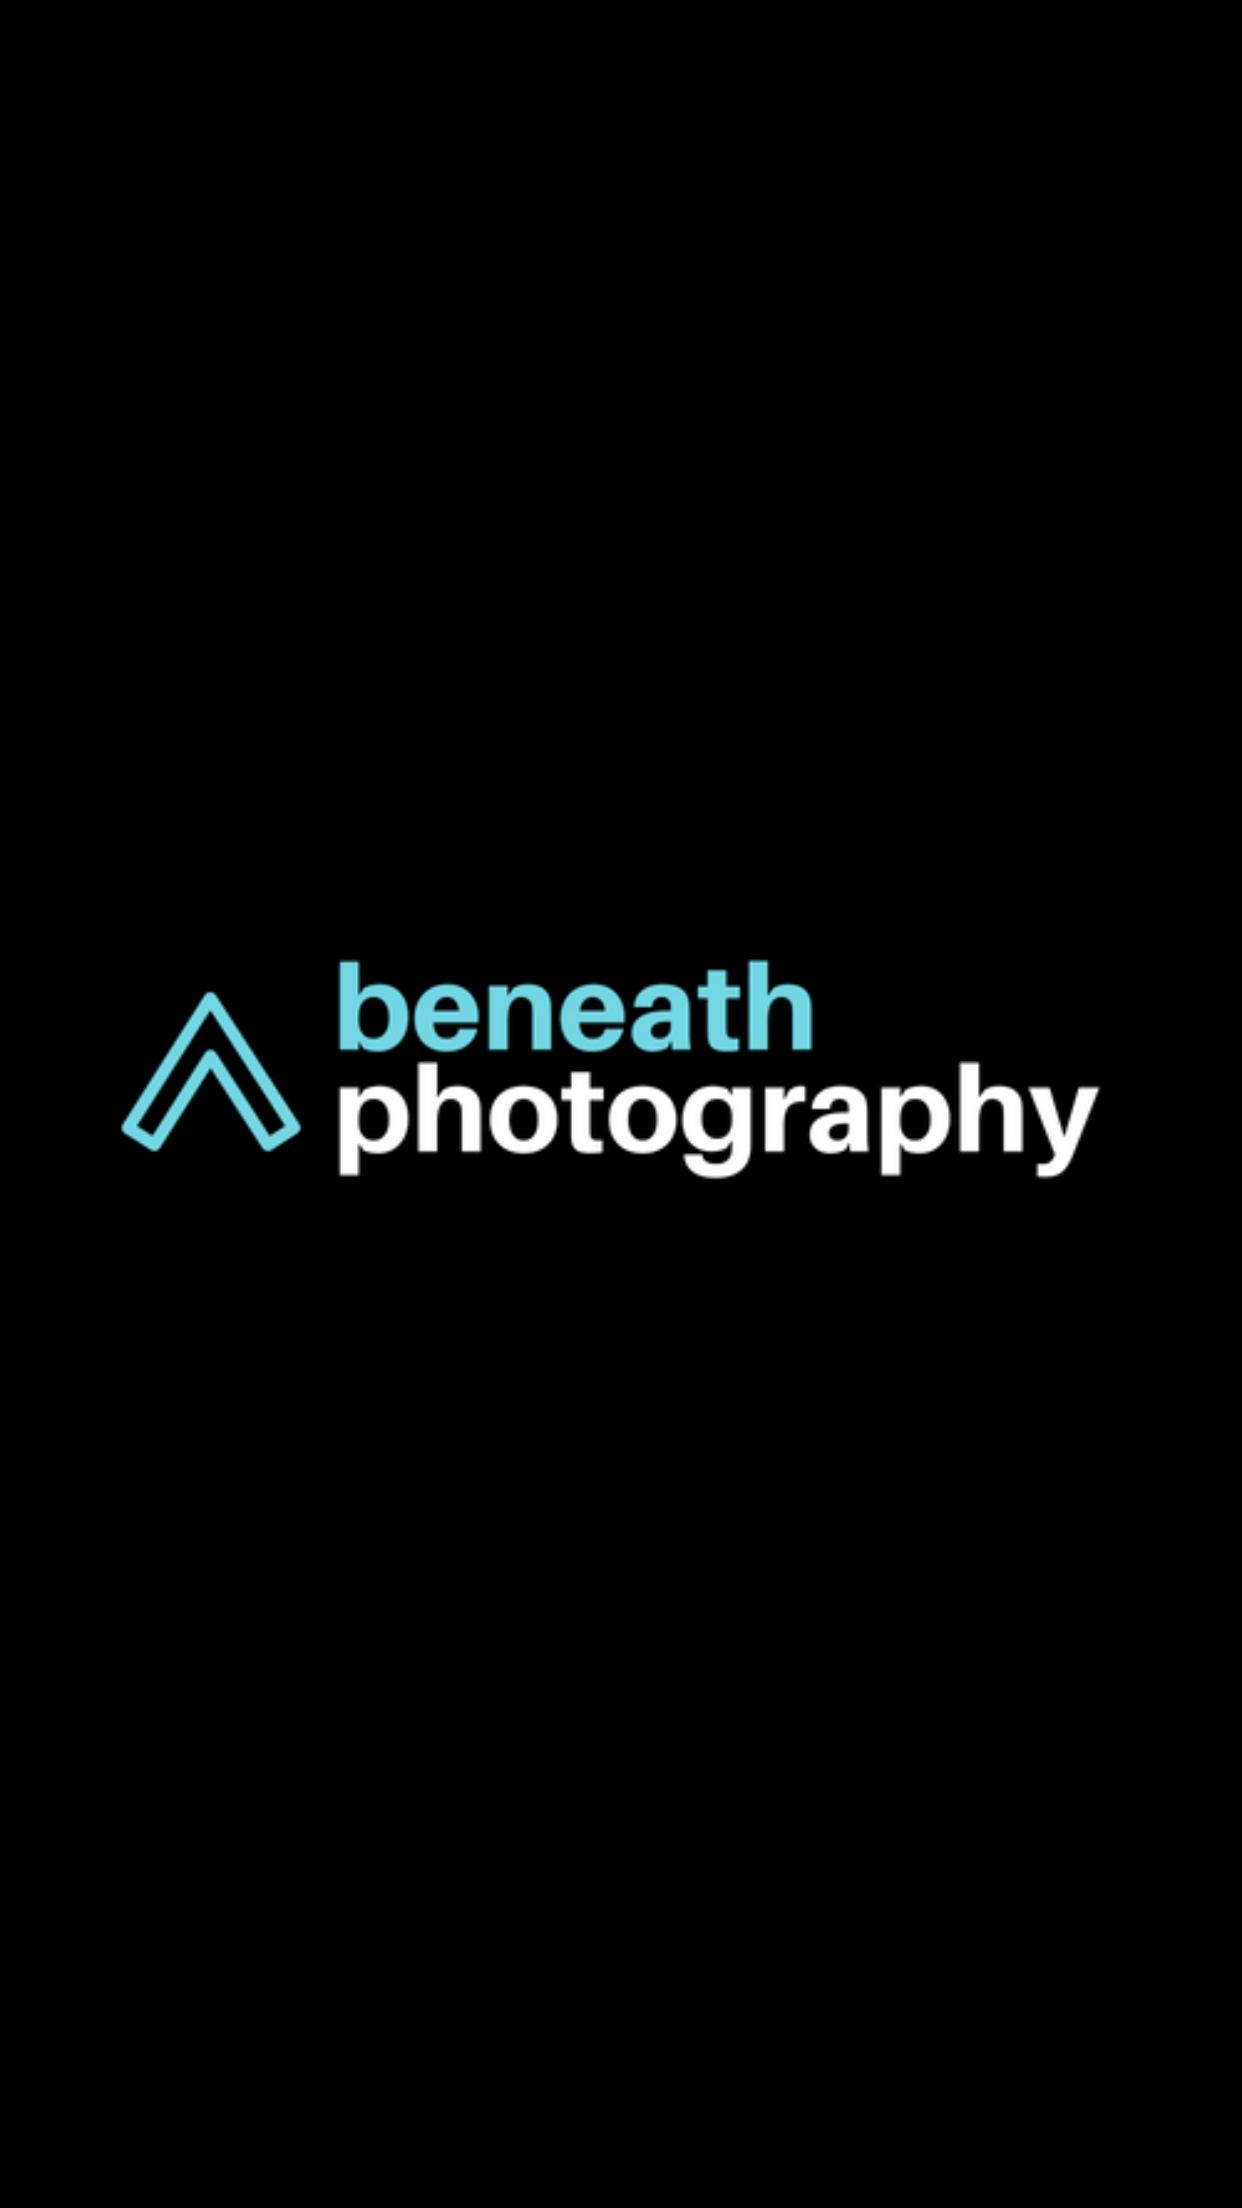 Go to Ben Krygsman's profile